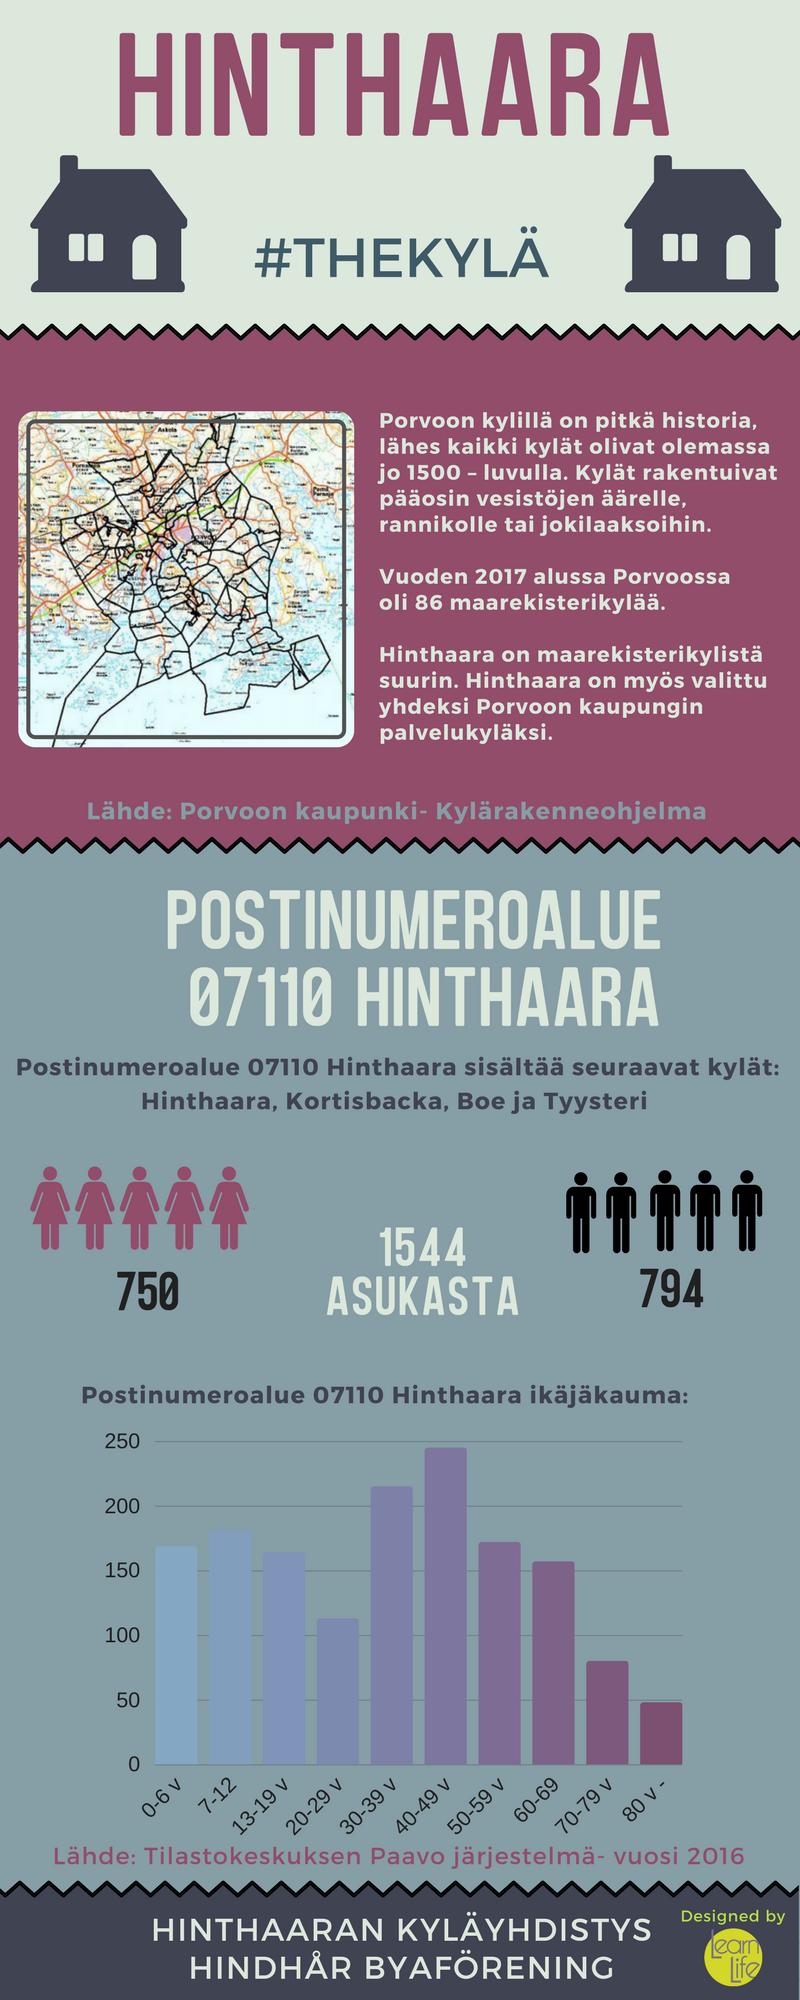 hinthaara_infograafi_hinthaarankyläyhdistys.png